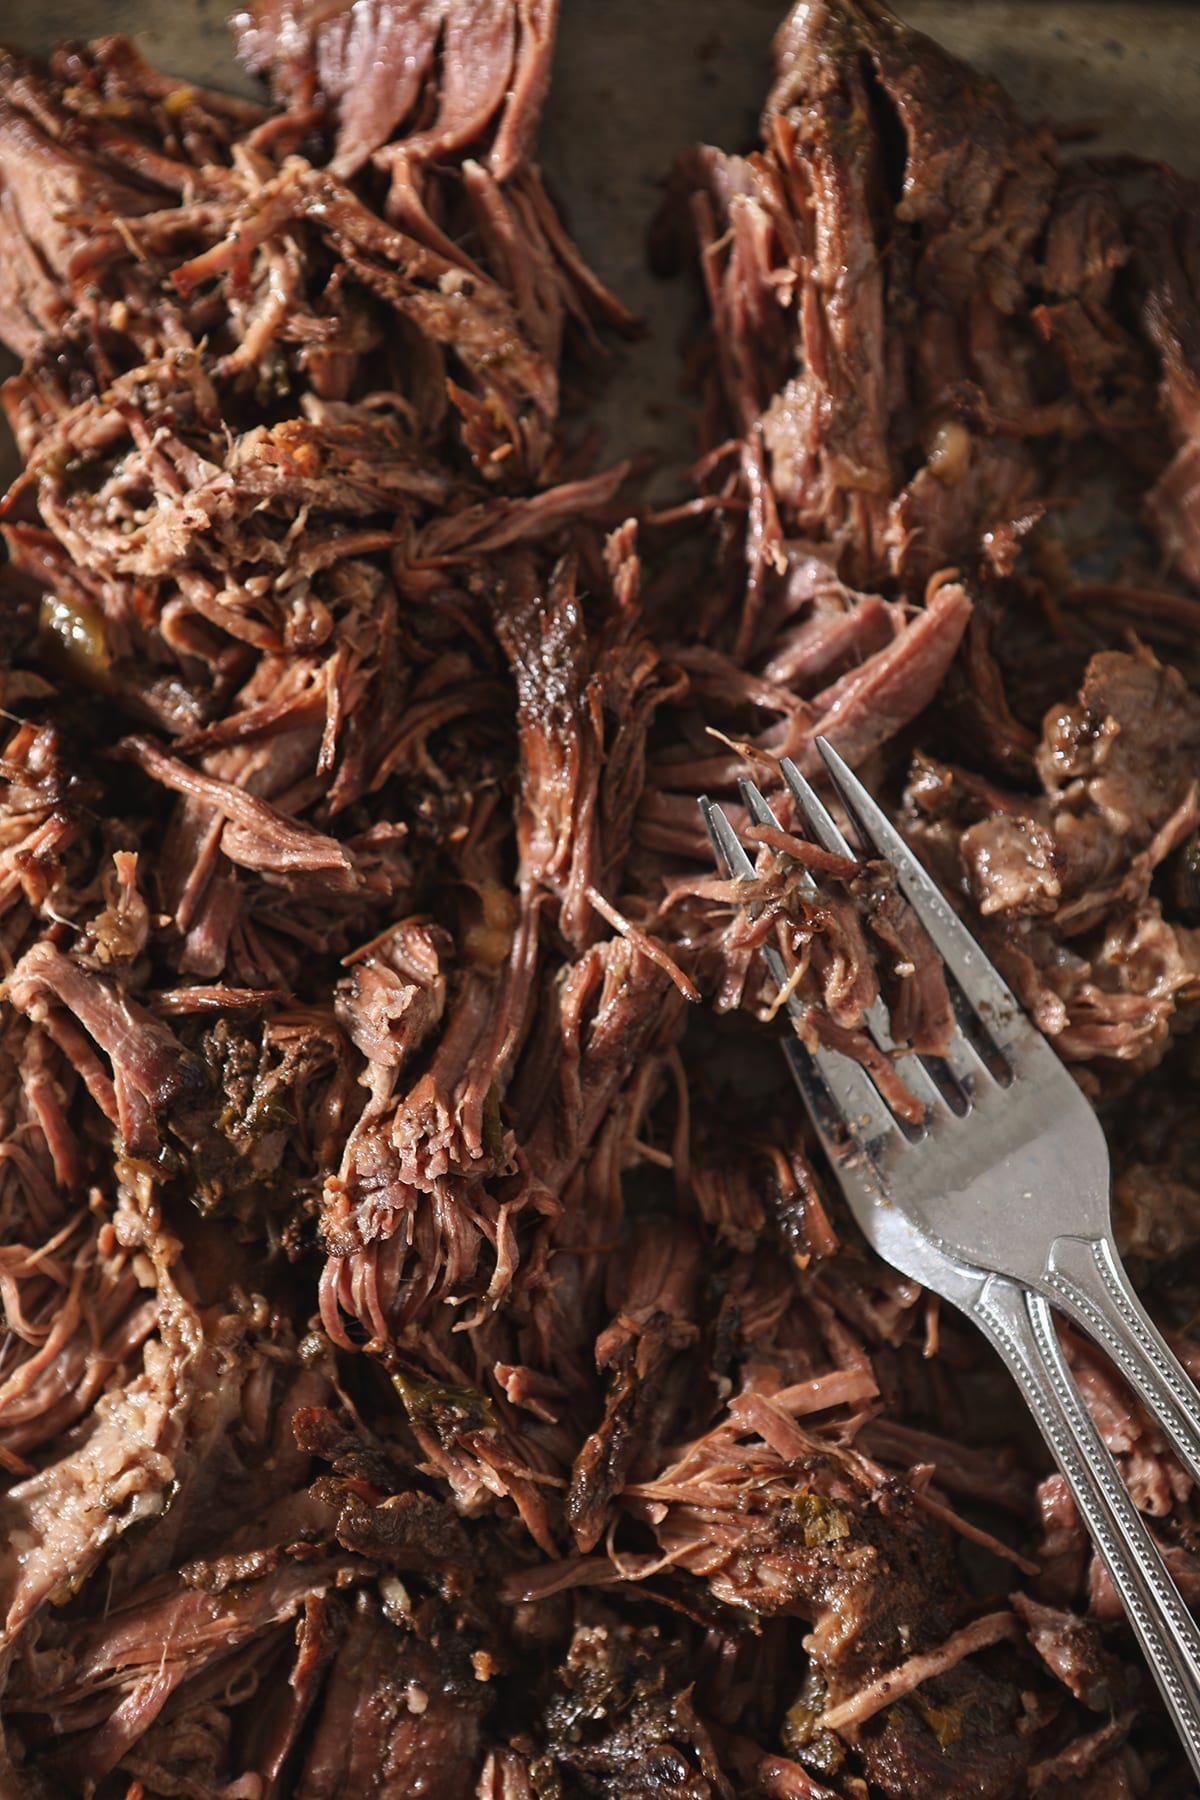 Close up of shredded slow cooker pot roast with forks